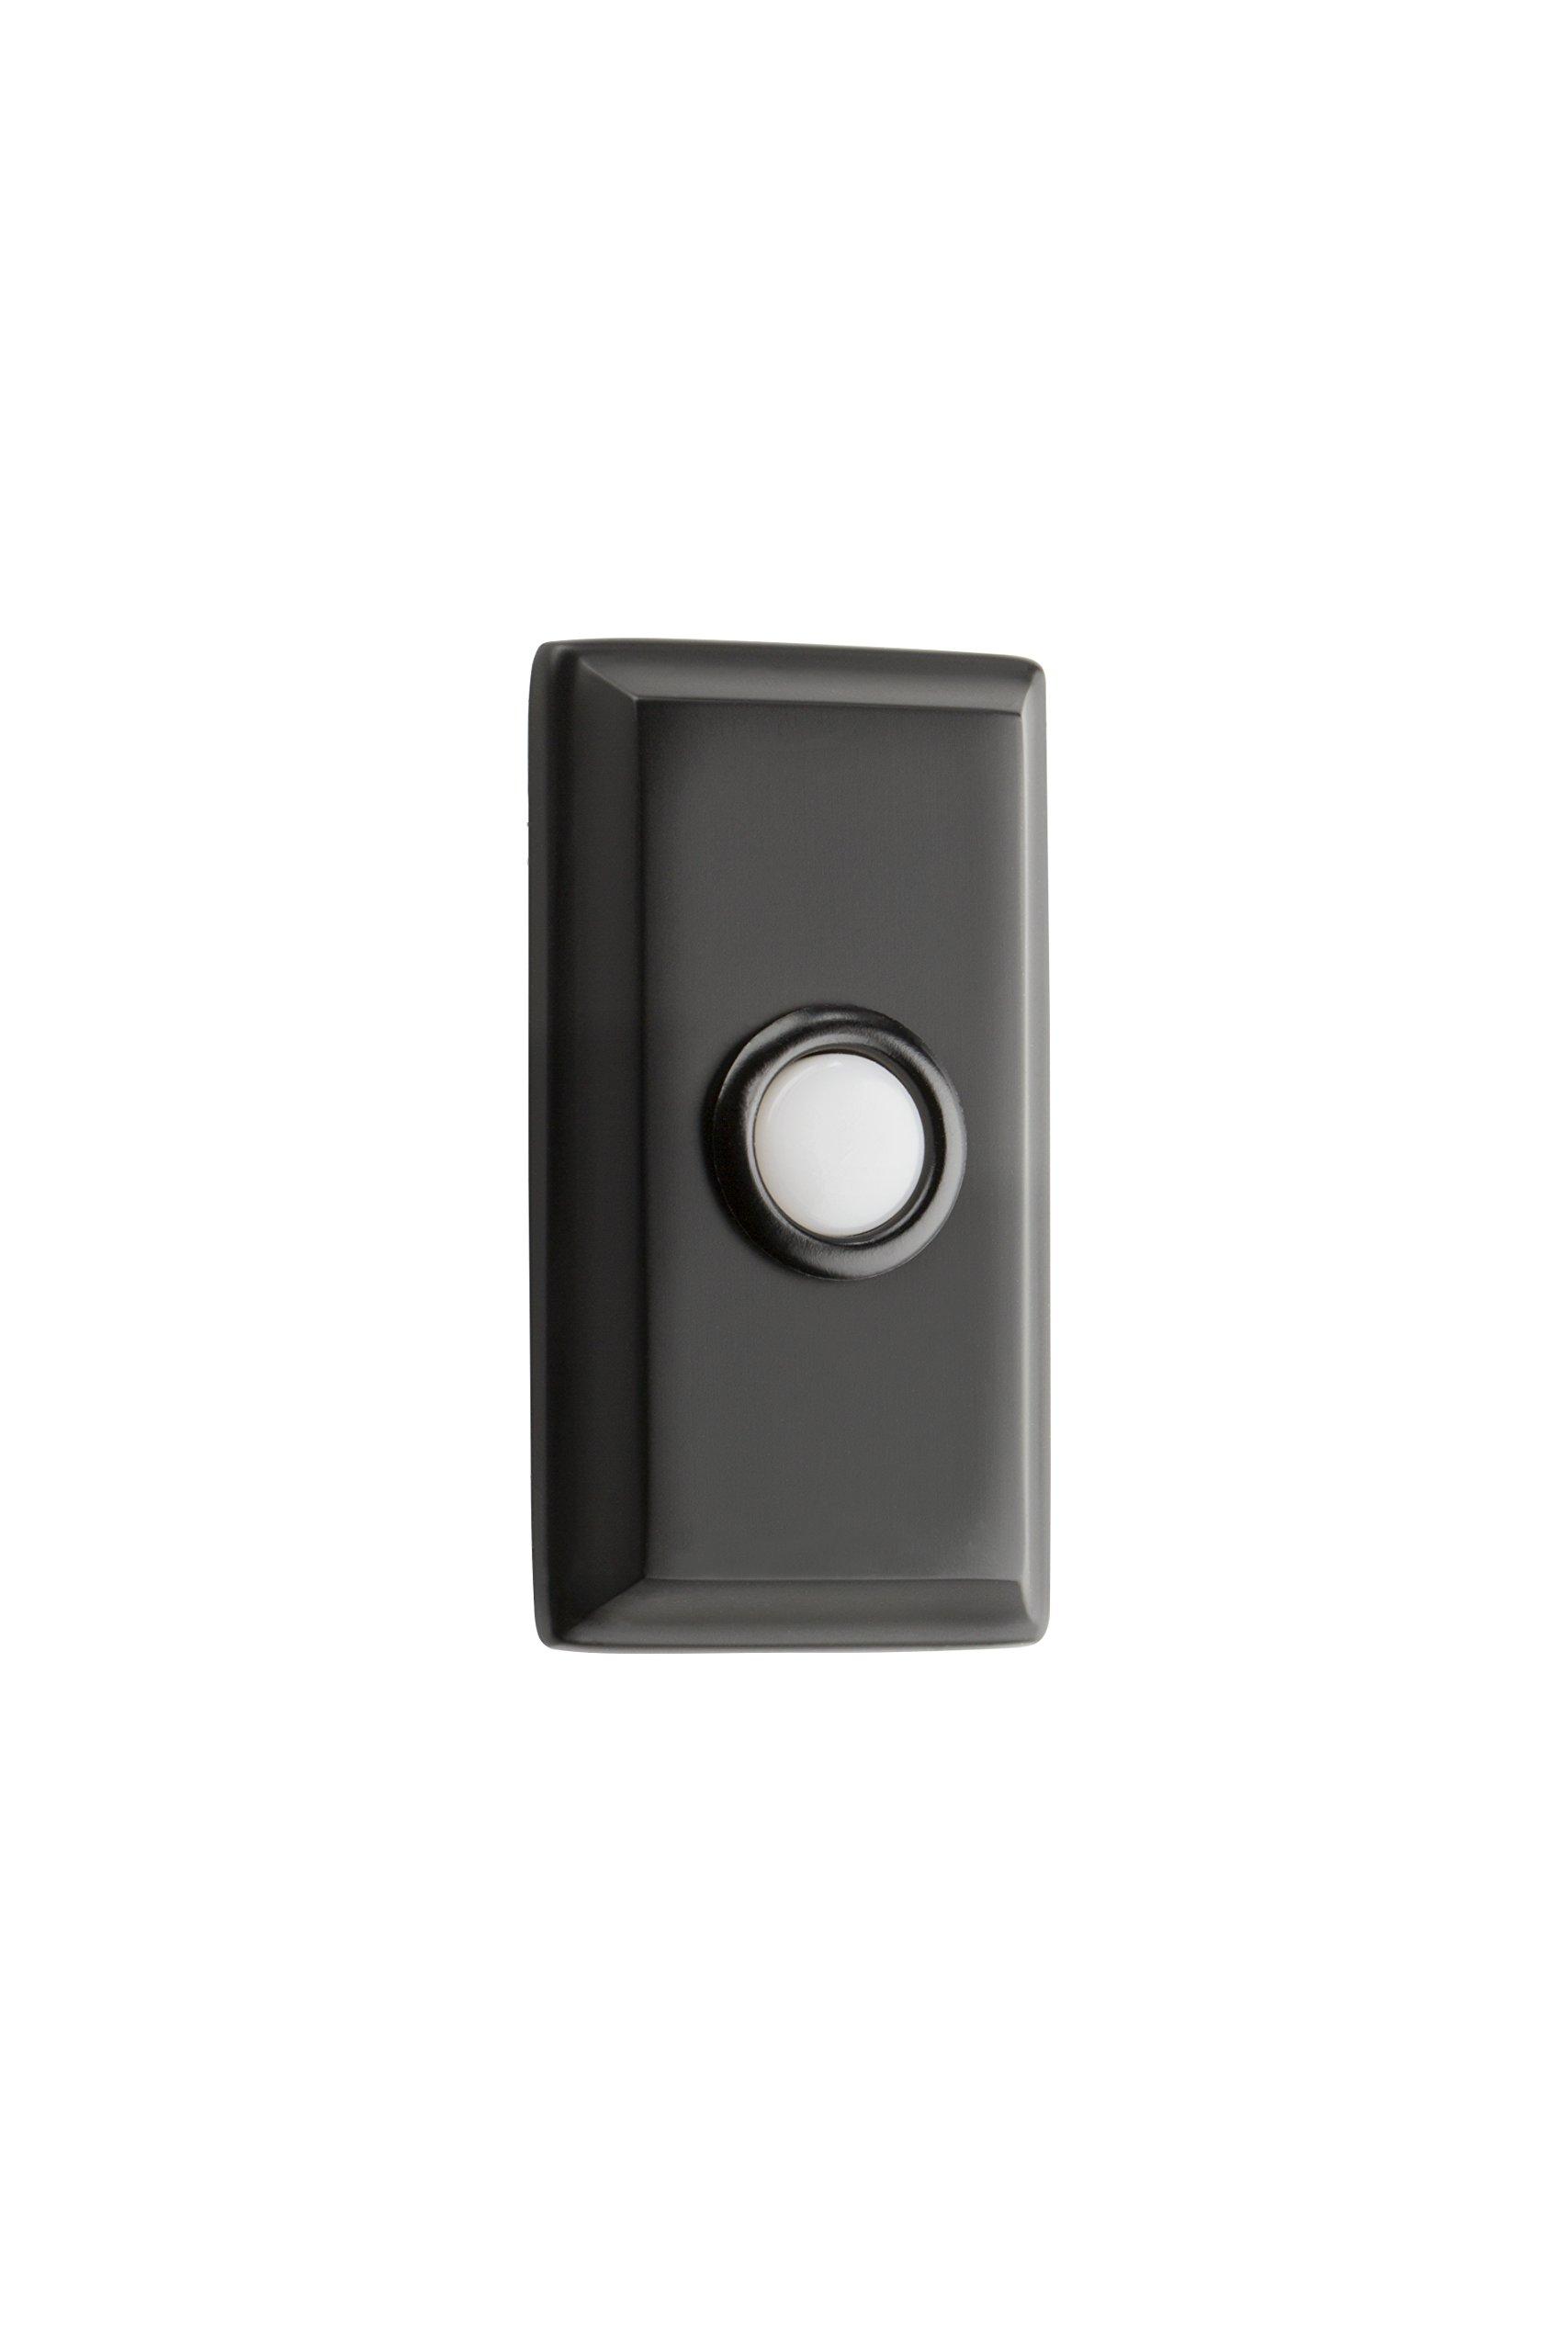 Baldwin 9BR7015-010 Reserve Contemporary Rectangular Door Bell Button, Satin Black